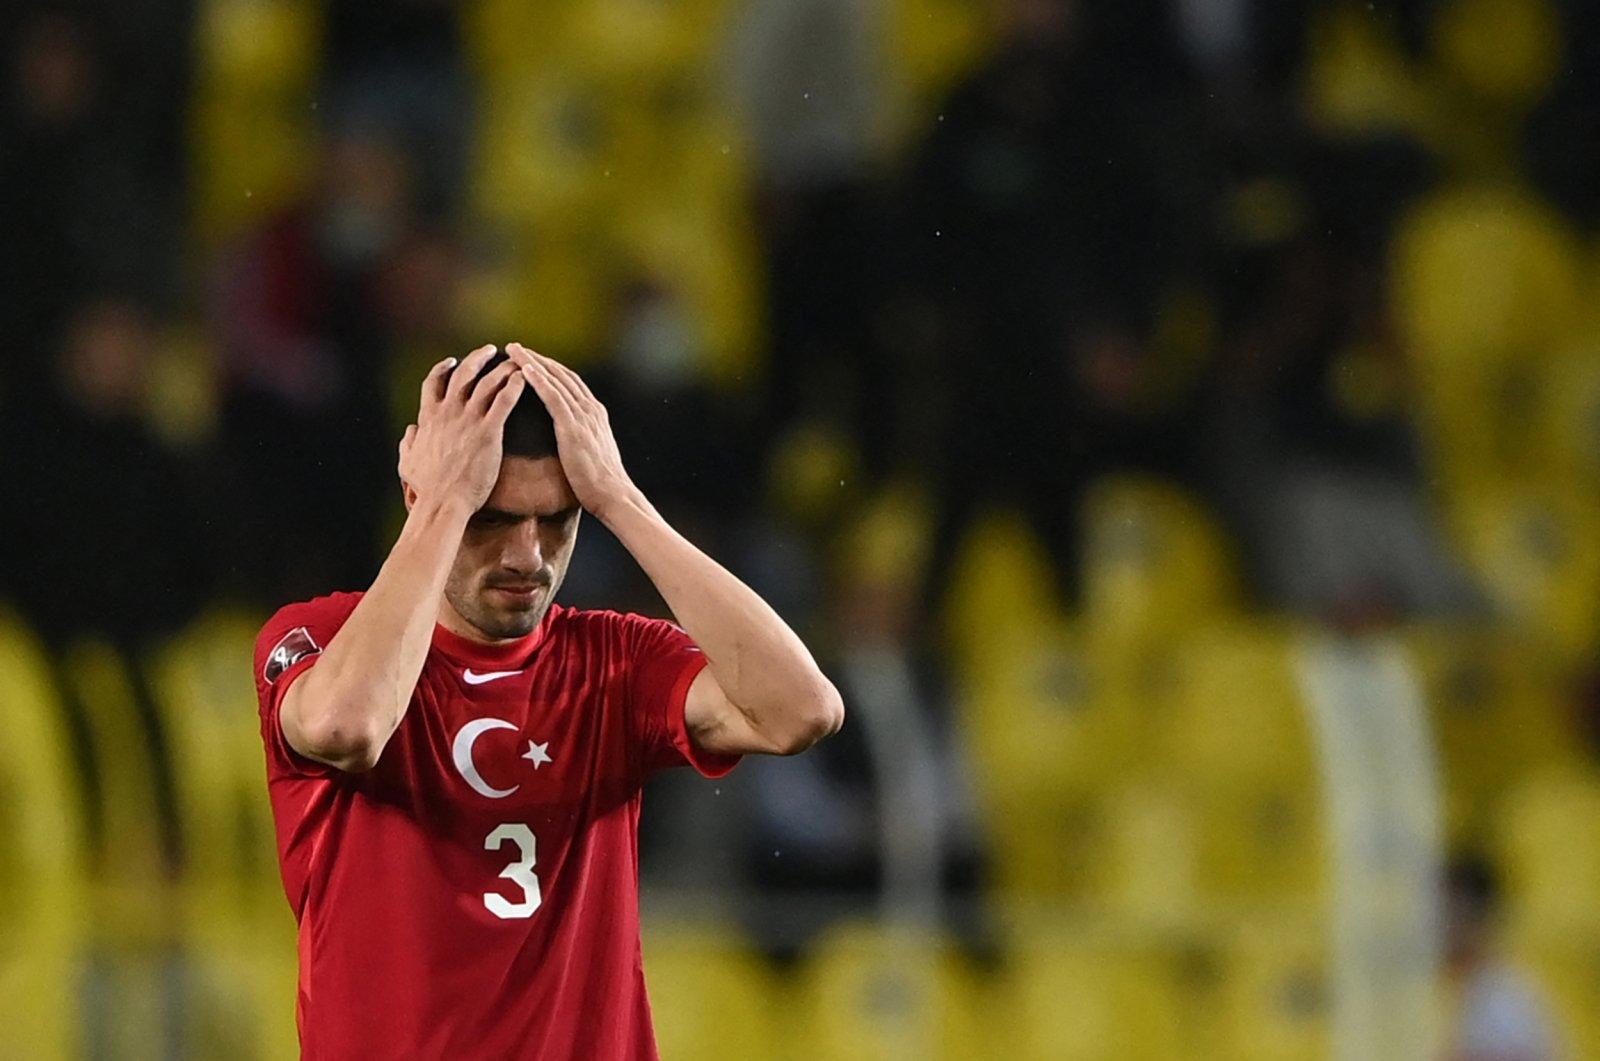 Turkey's Merih Demiral reacts during a World Cup 2022 qualifier match against Norway at the Şükrü Saraçoğlu Stadium in Istanbul, Turkey, Oct. 8, 2021. (AFP Photo)